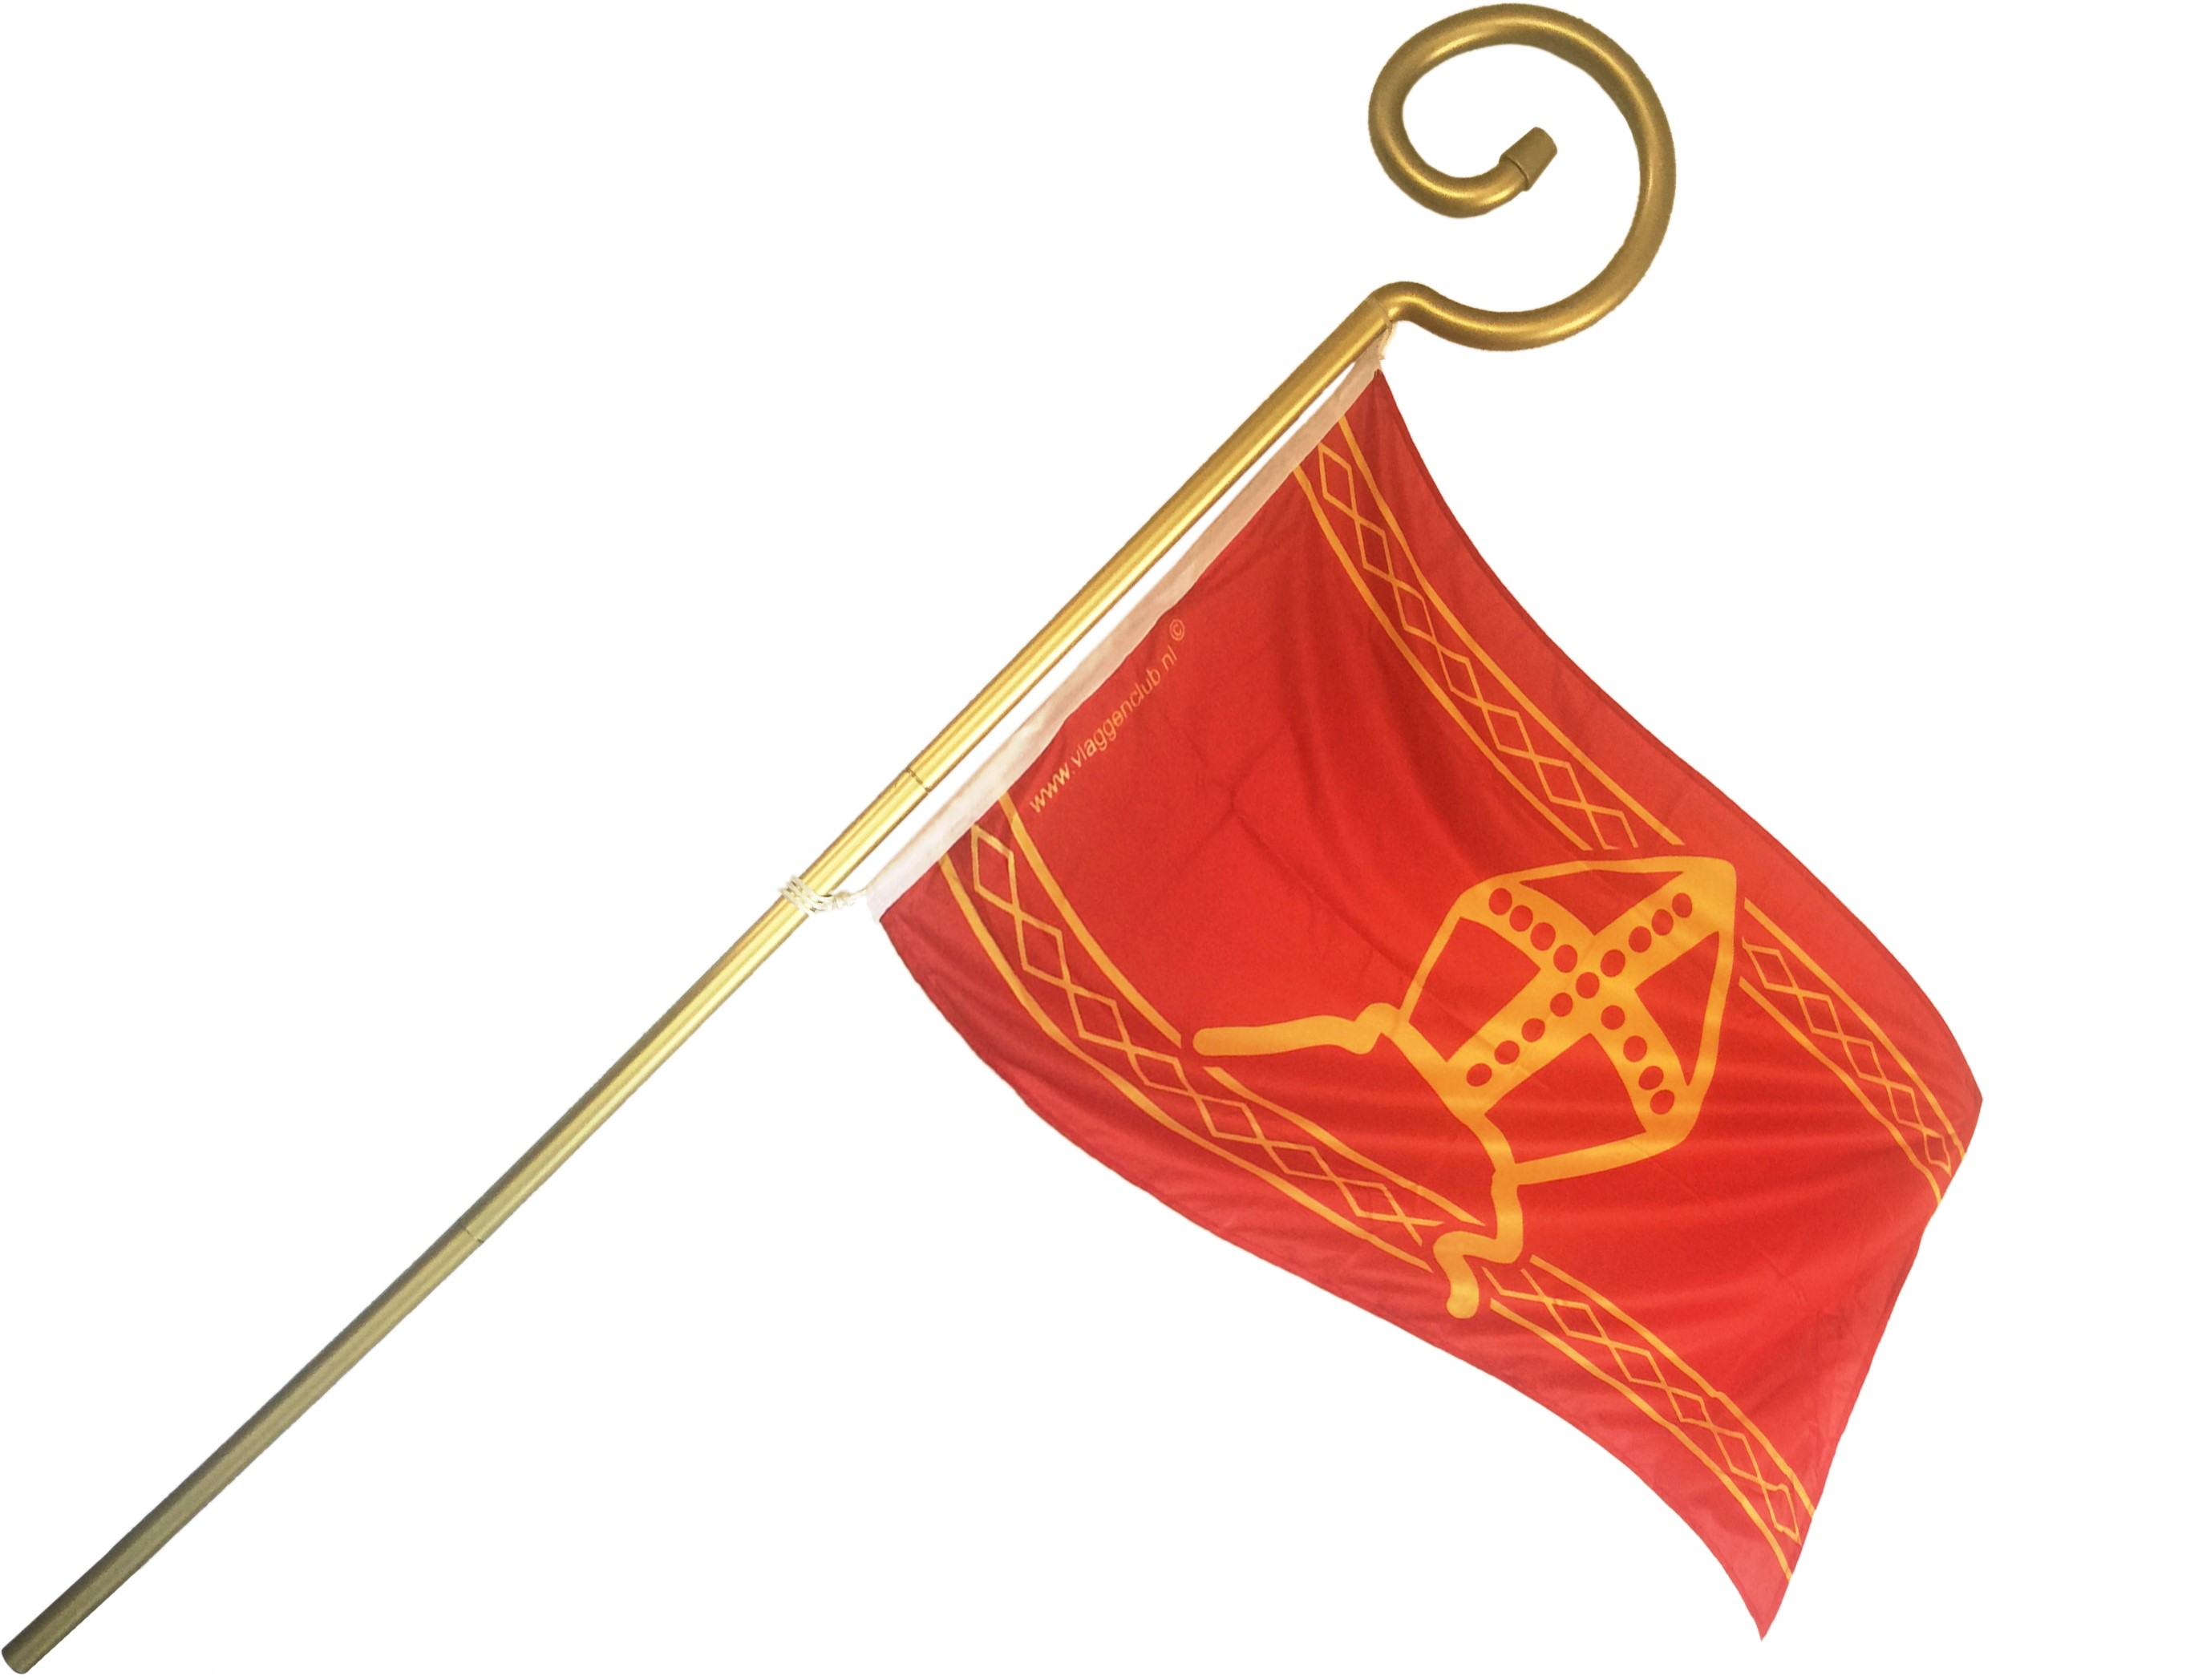 sinterklaas-vlag-van-sinterklaasstaf